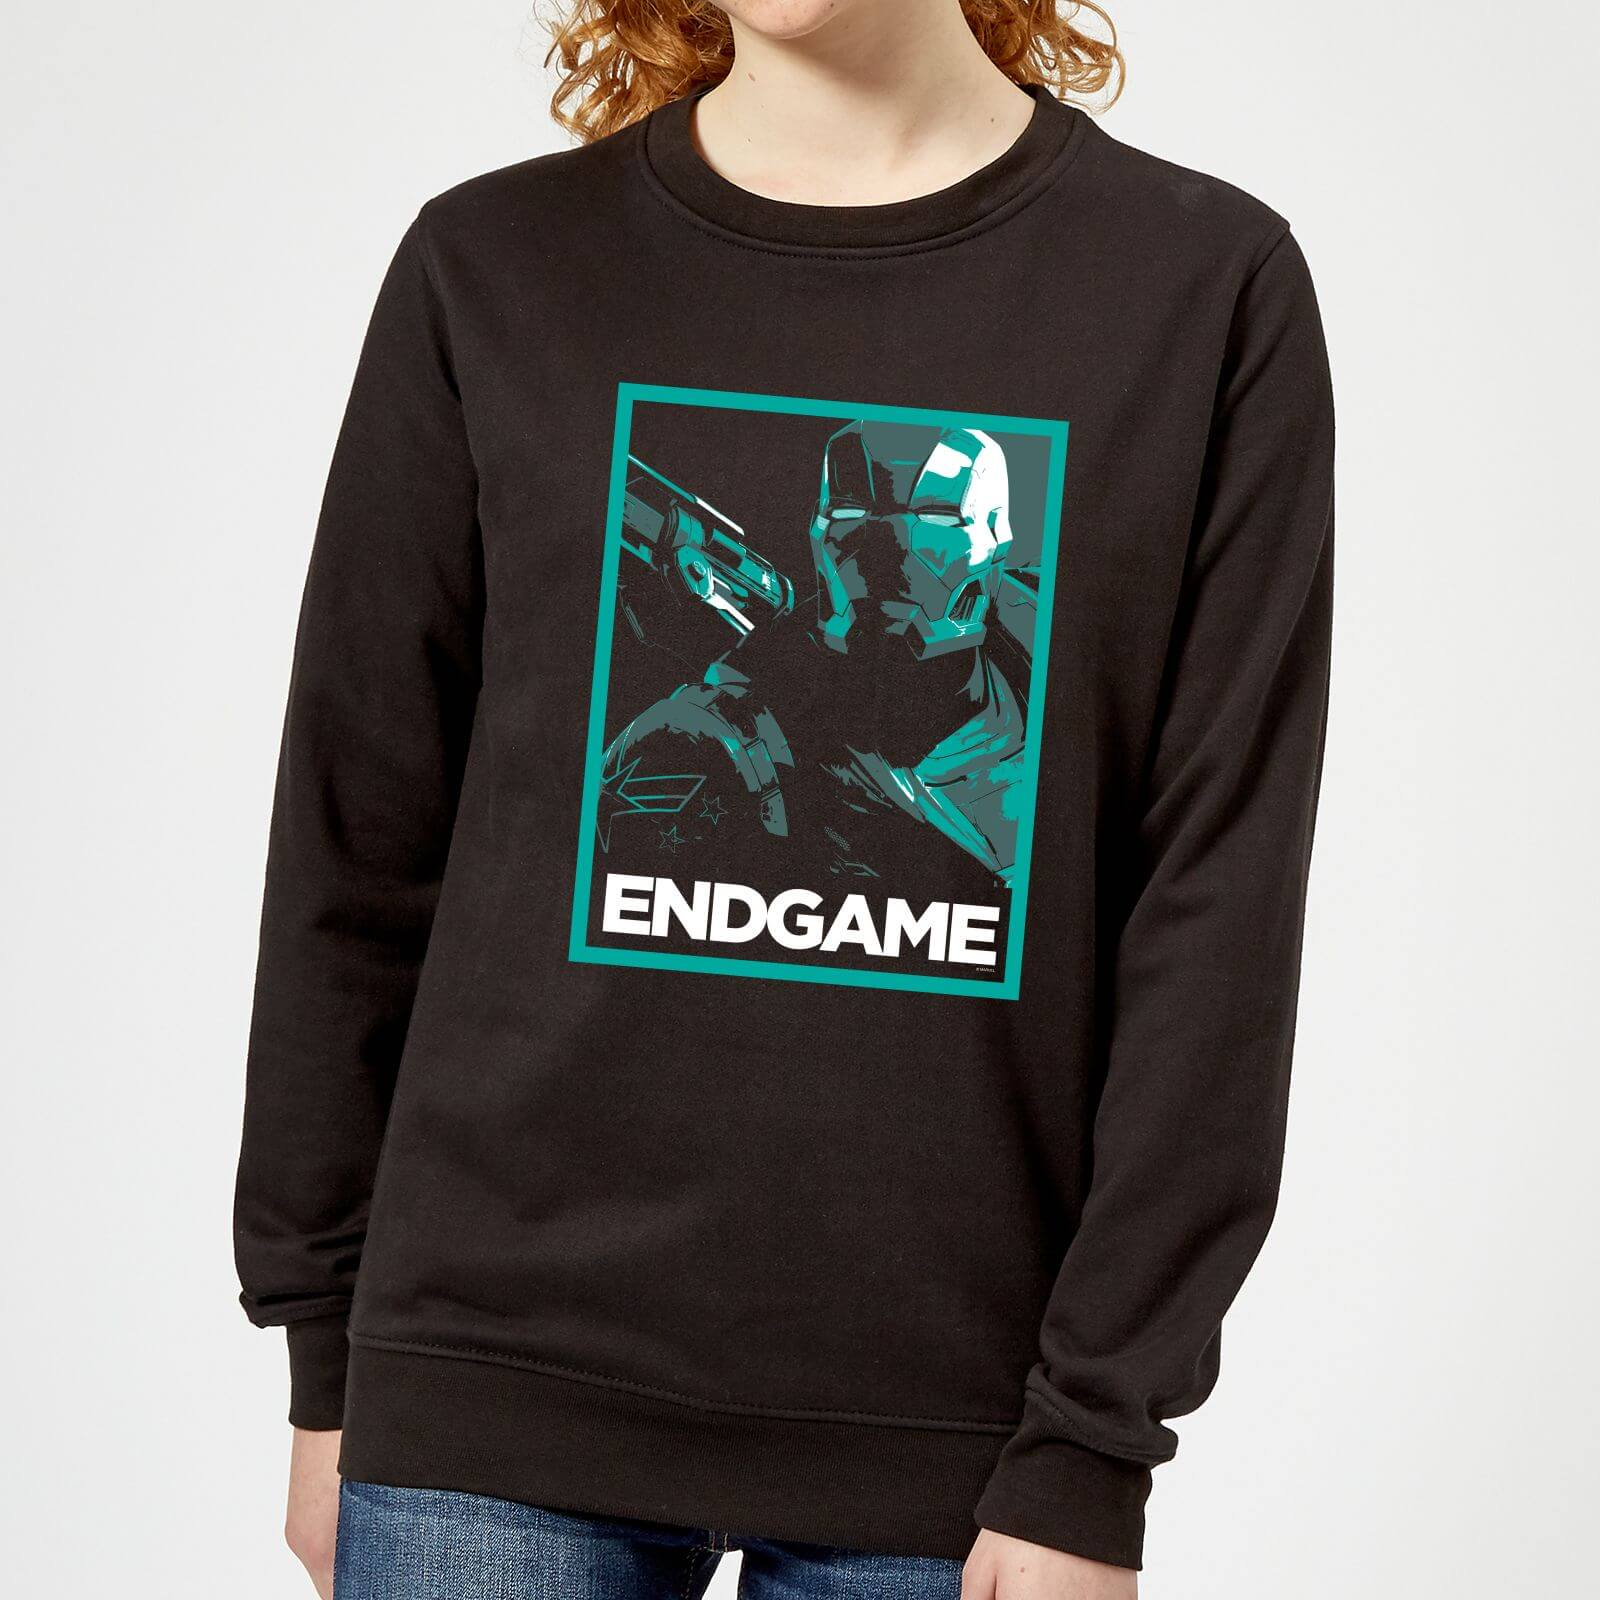 Marvel Avengers Endgame War Machine Poster Women's Sweatshirt - Black - XL - Black